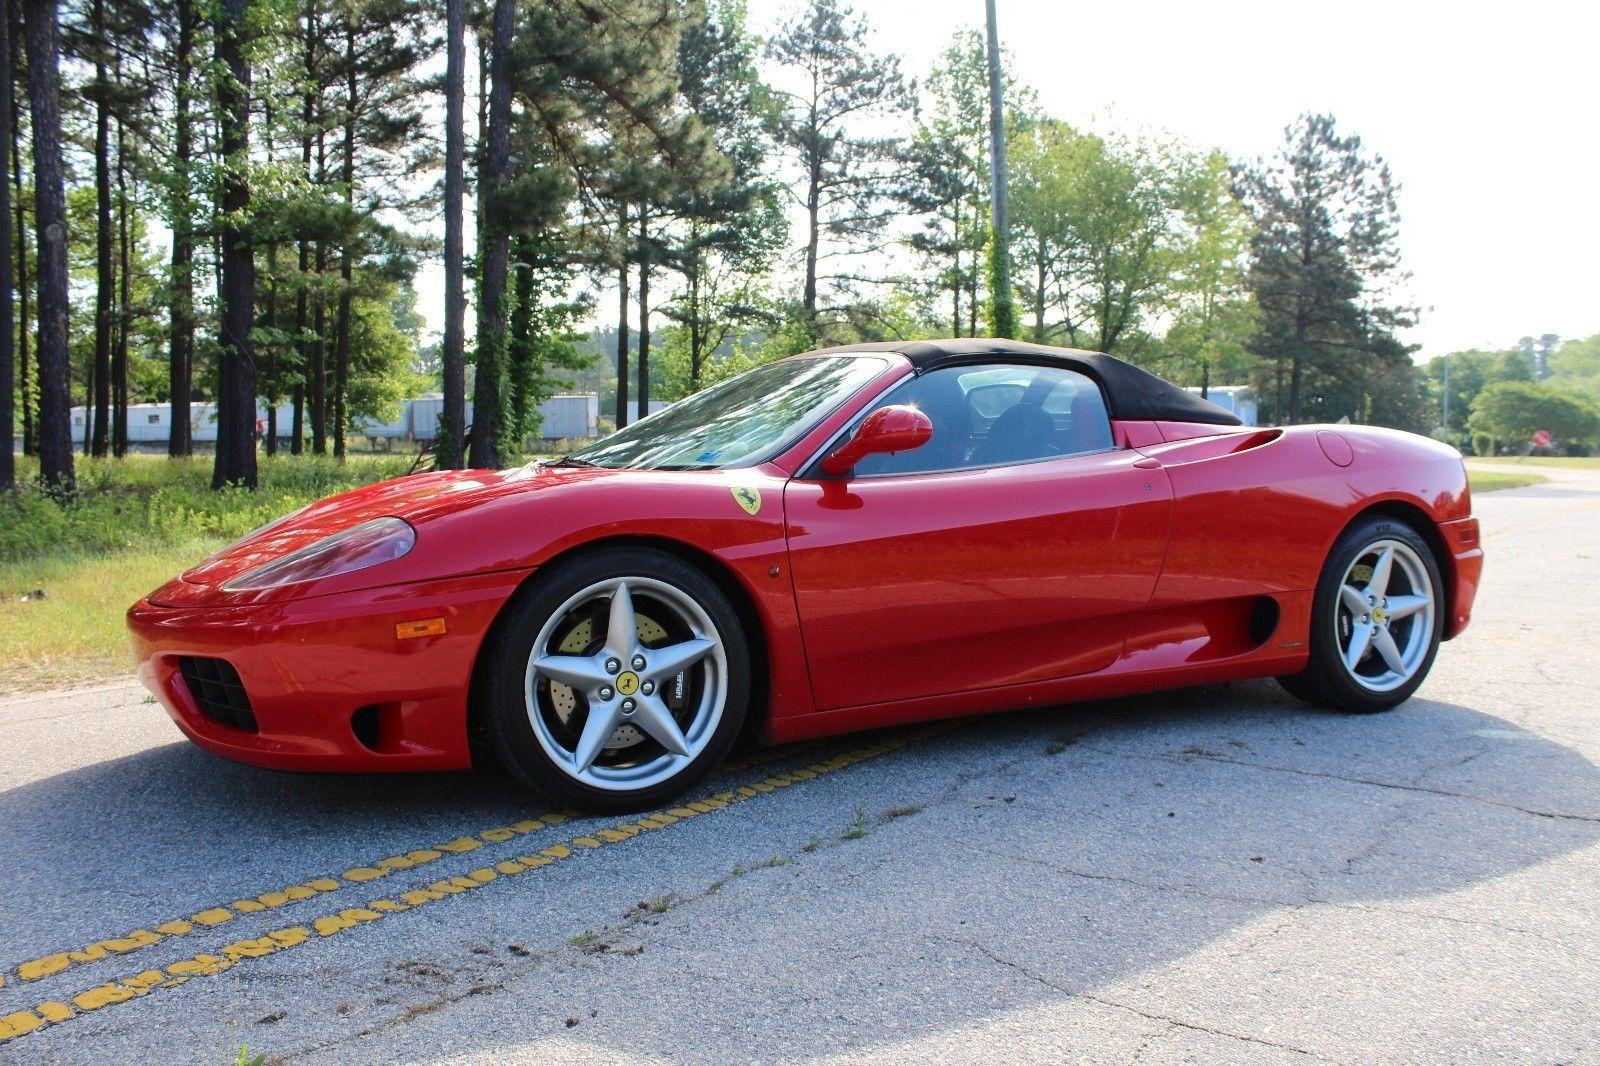 Awesome Amazing 2001 Ferrari 360 Modena Spyder 2001 Ferrari 360